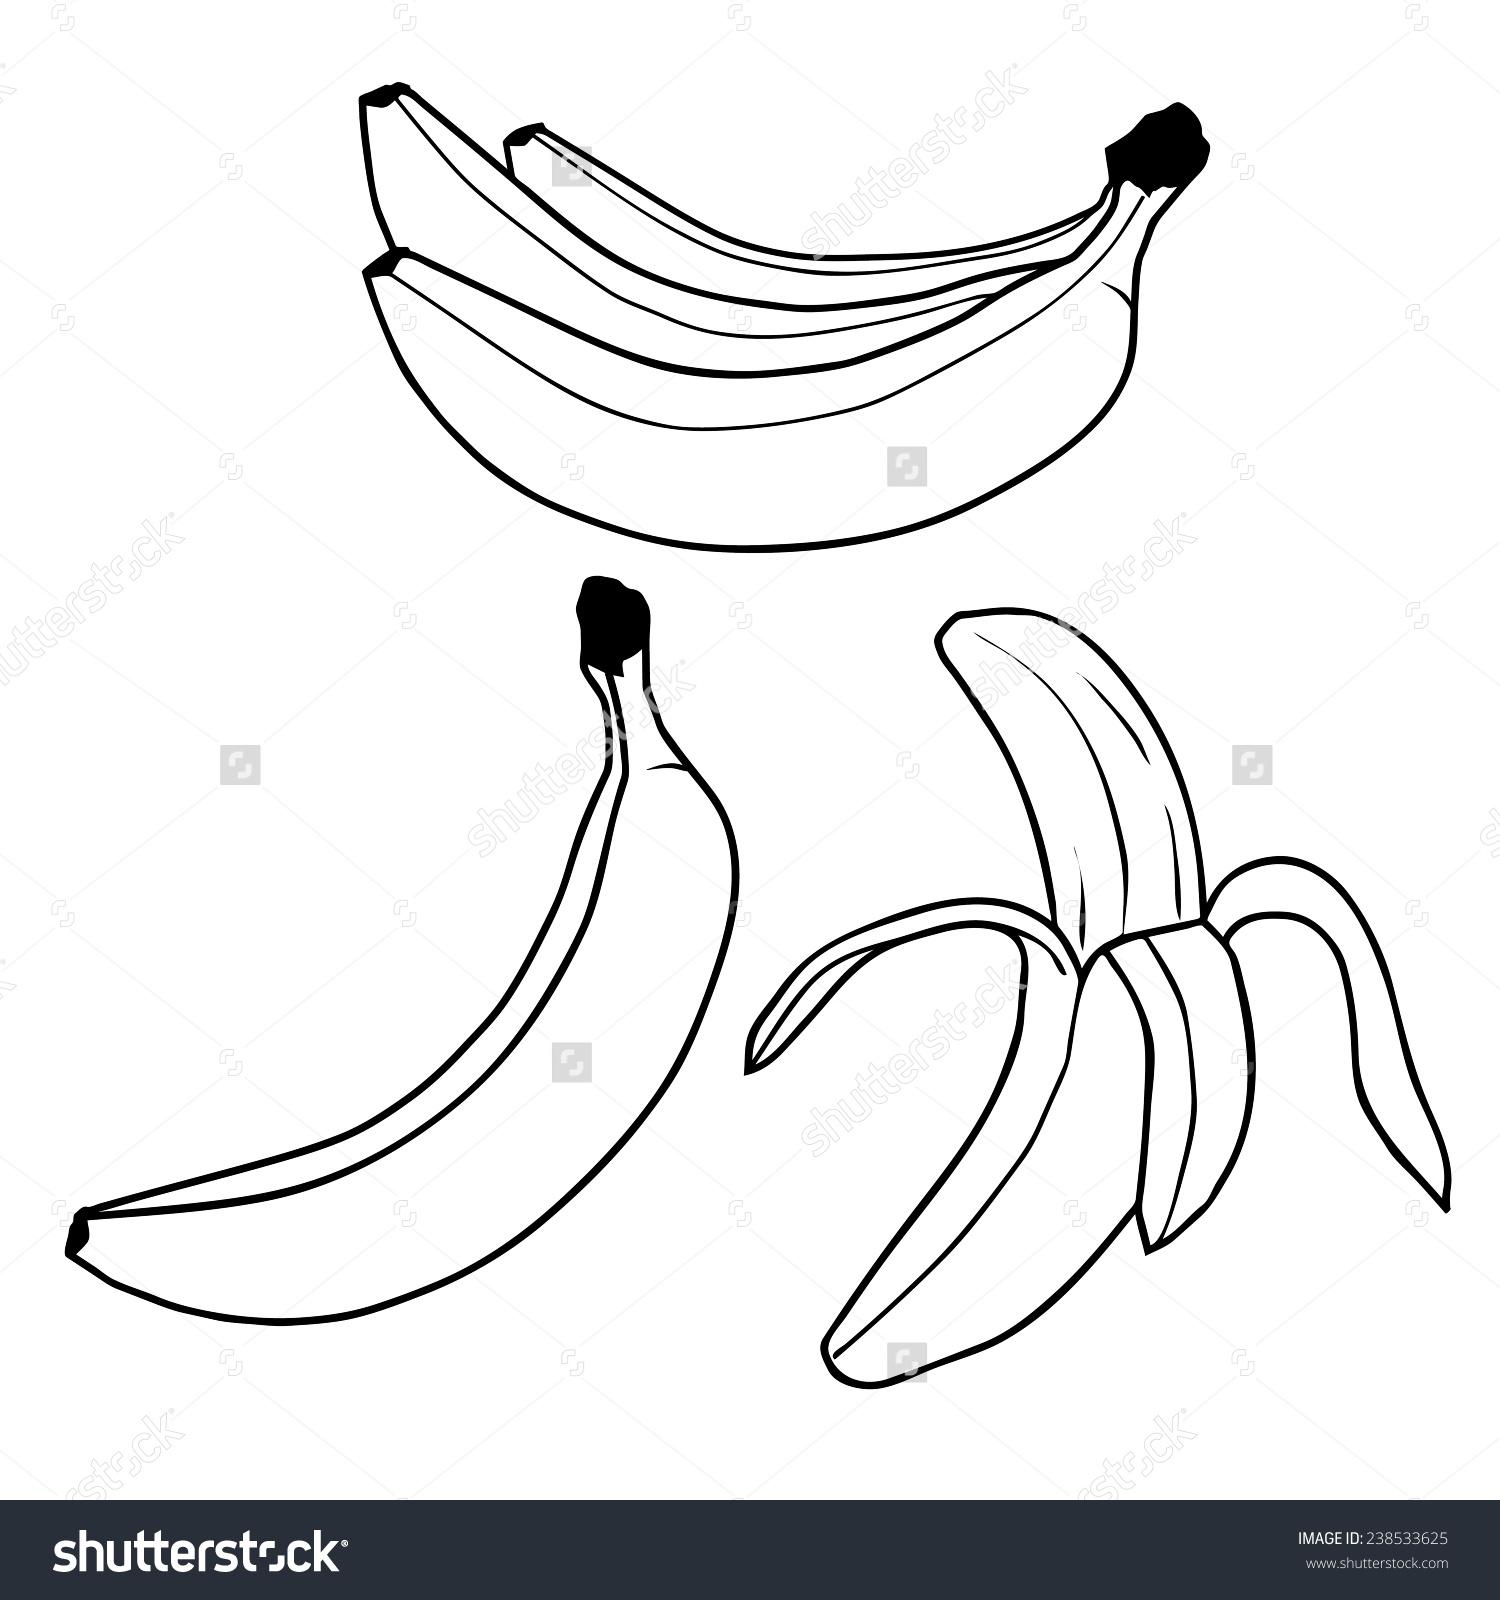 1500x1600 Image Result For Banana Sketch Babyface's Bday Sketch